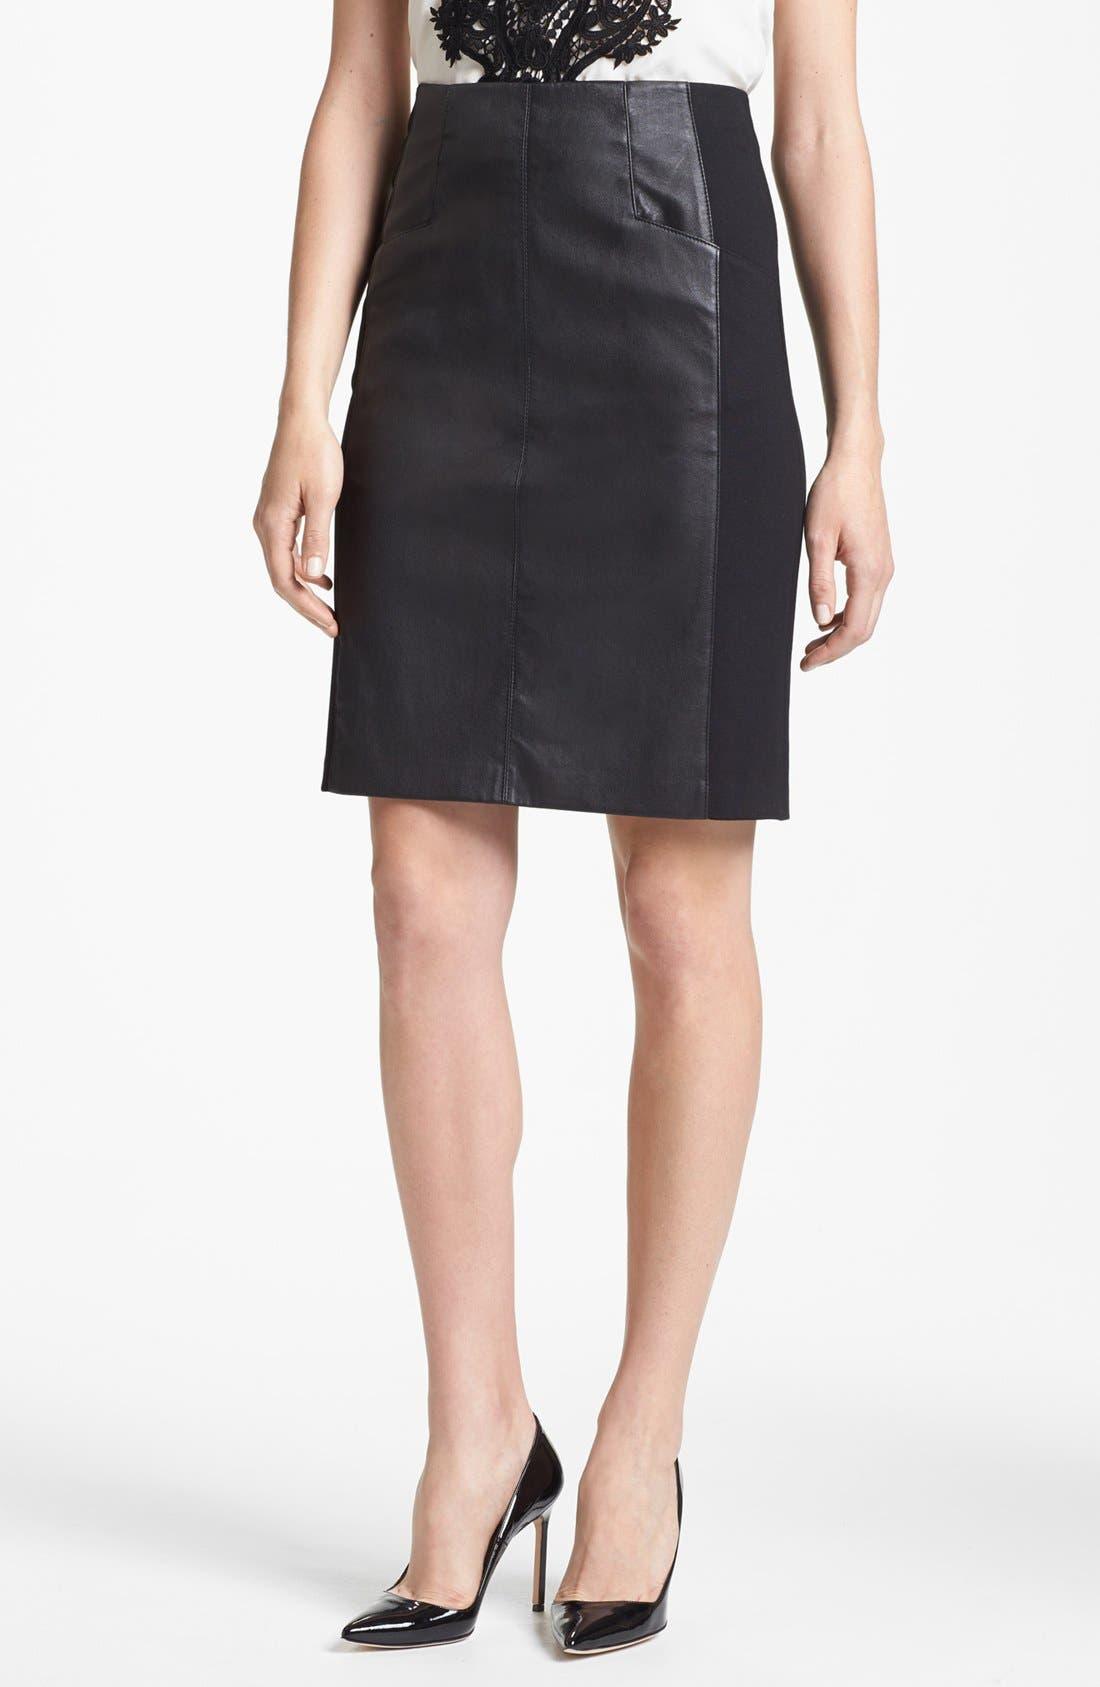 Main Image - Nanette Lepore 'Mime' Leather & Knit Skirt